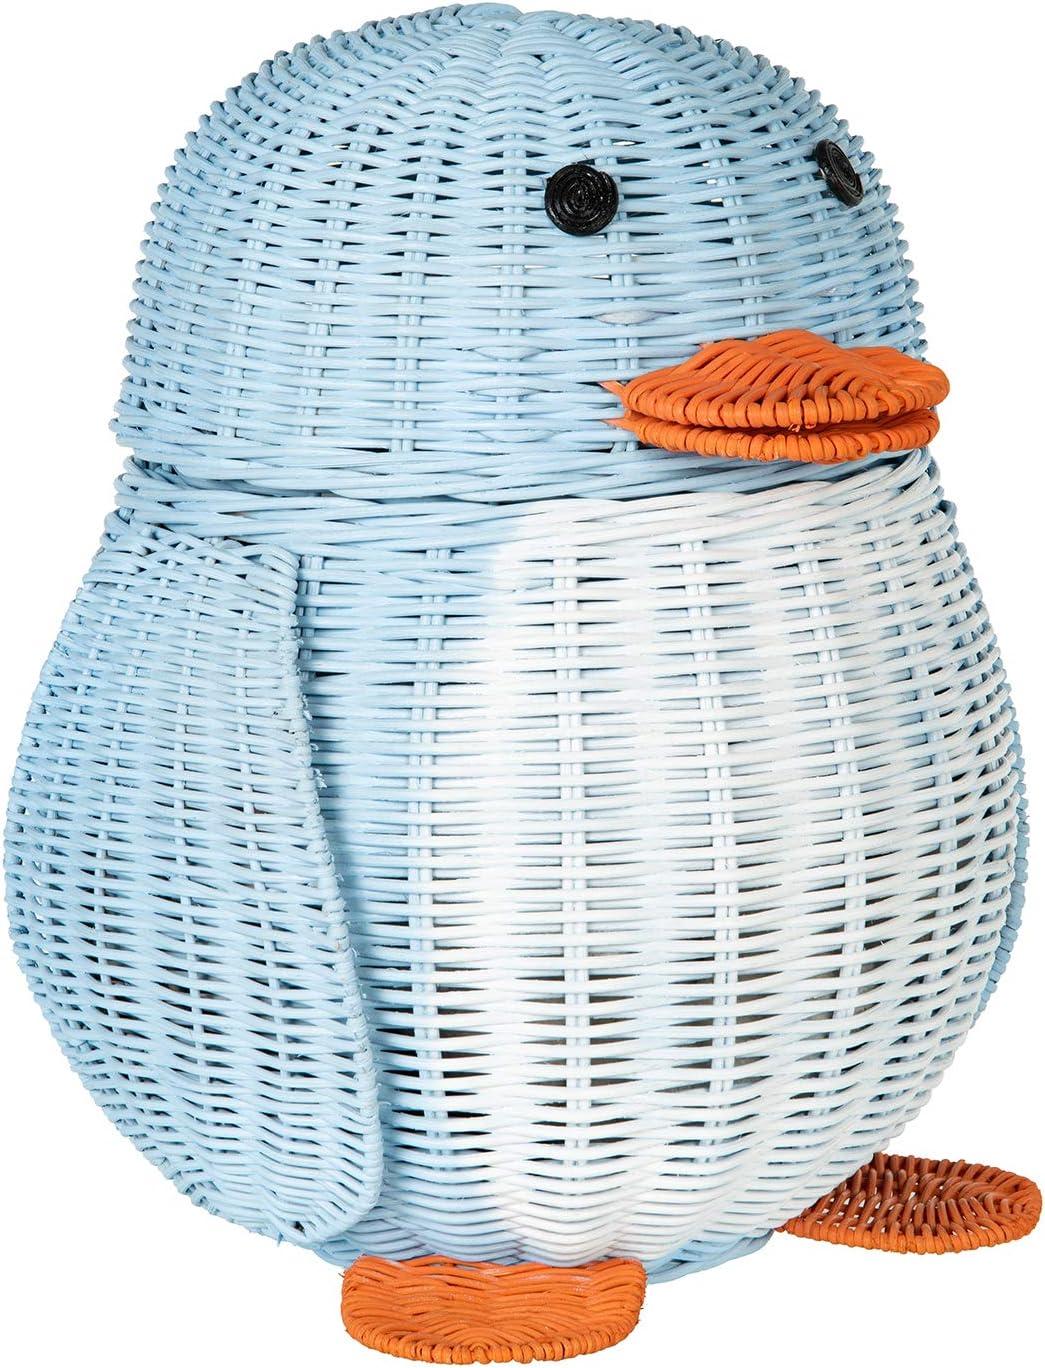 KOUBOO Wicker Penguin, Multi-Color Storage Basket Blue and White